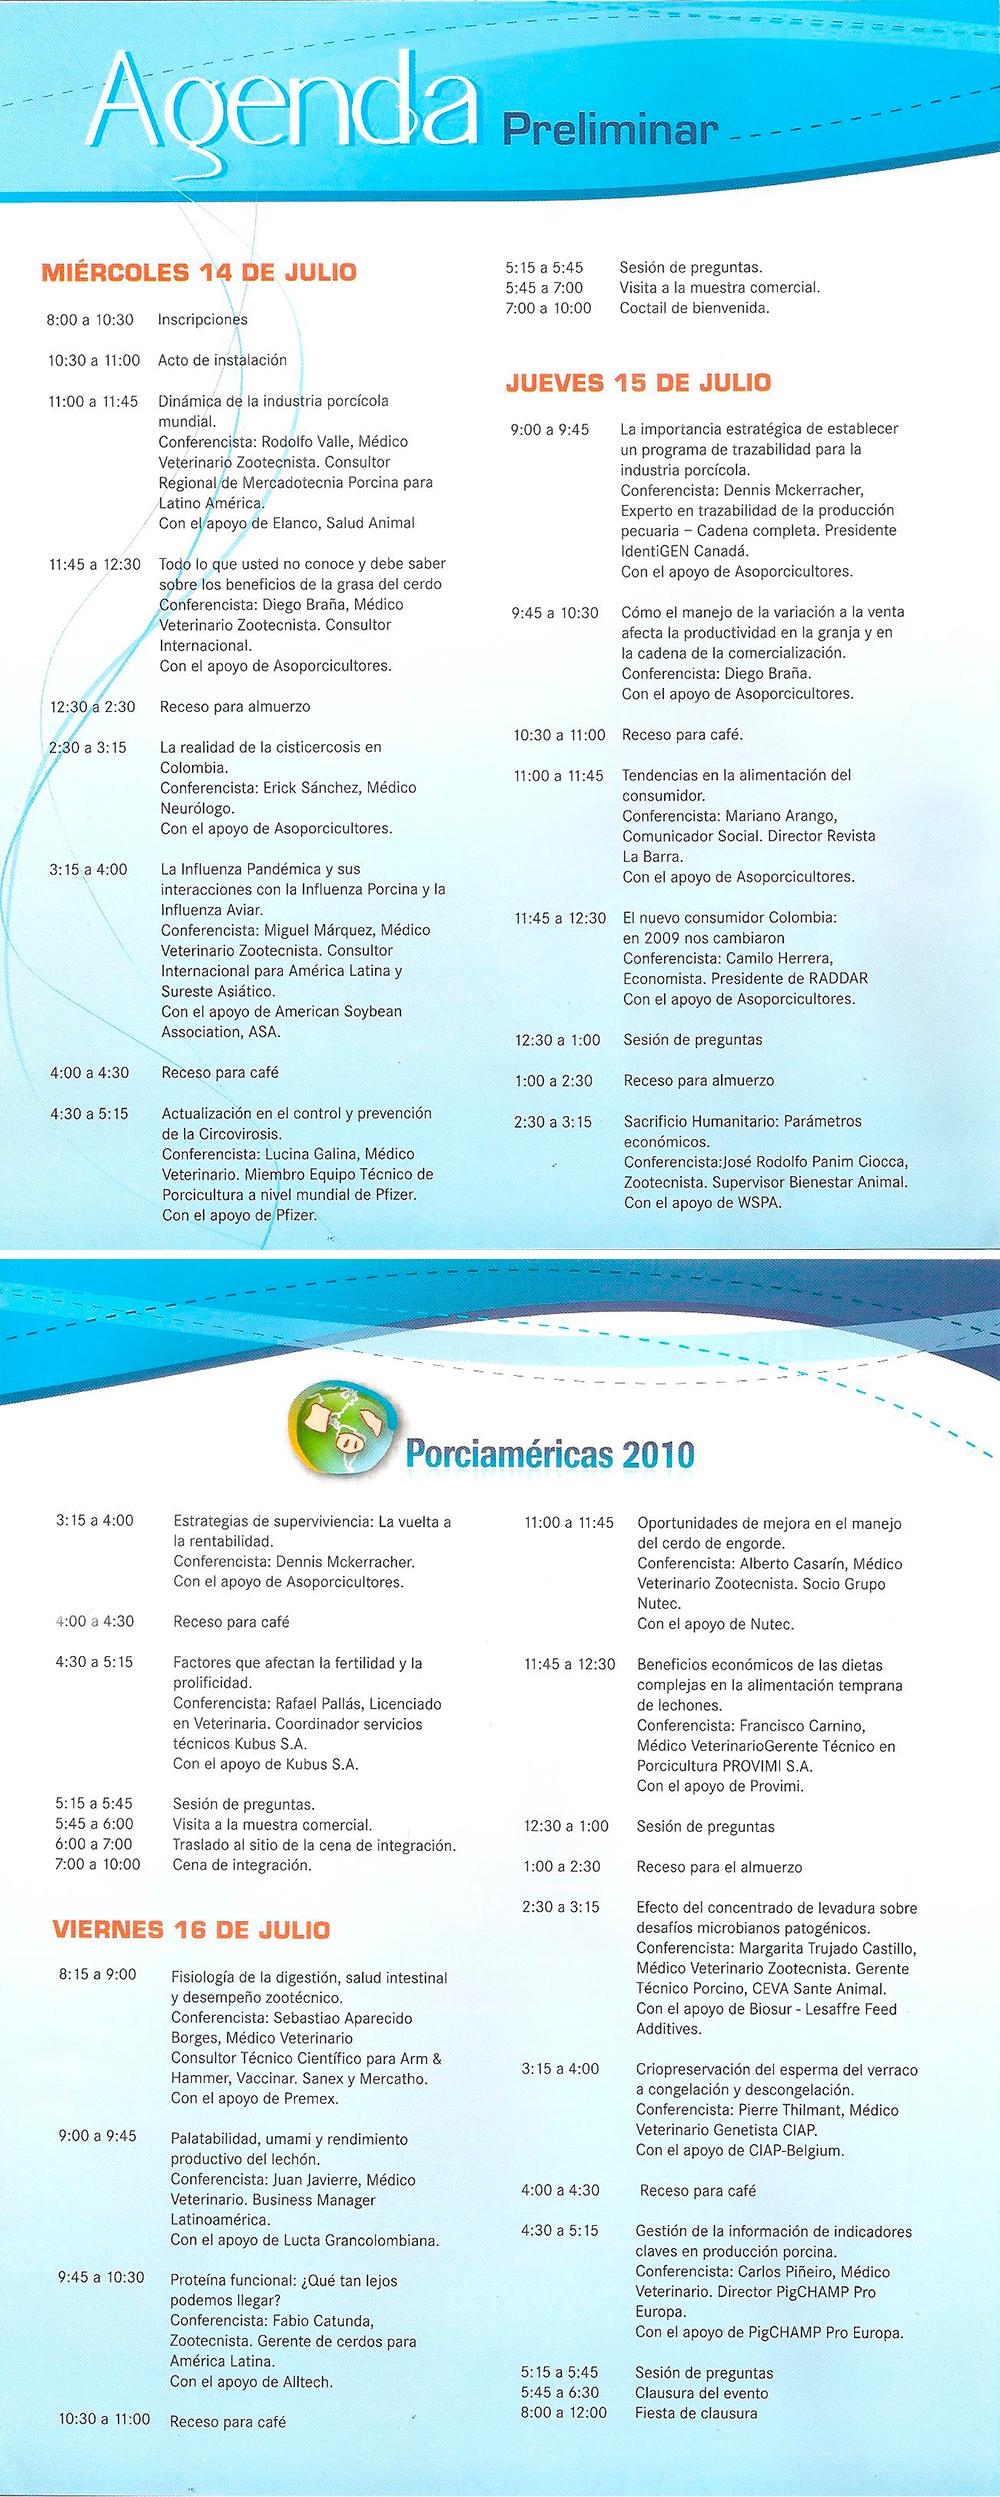 https://www.porkcolombia.co/wp-content/uploads/2018/07/agenda_porciamericas_2010.png